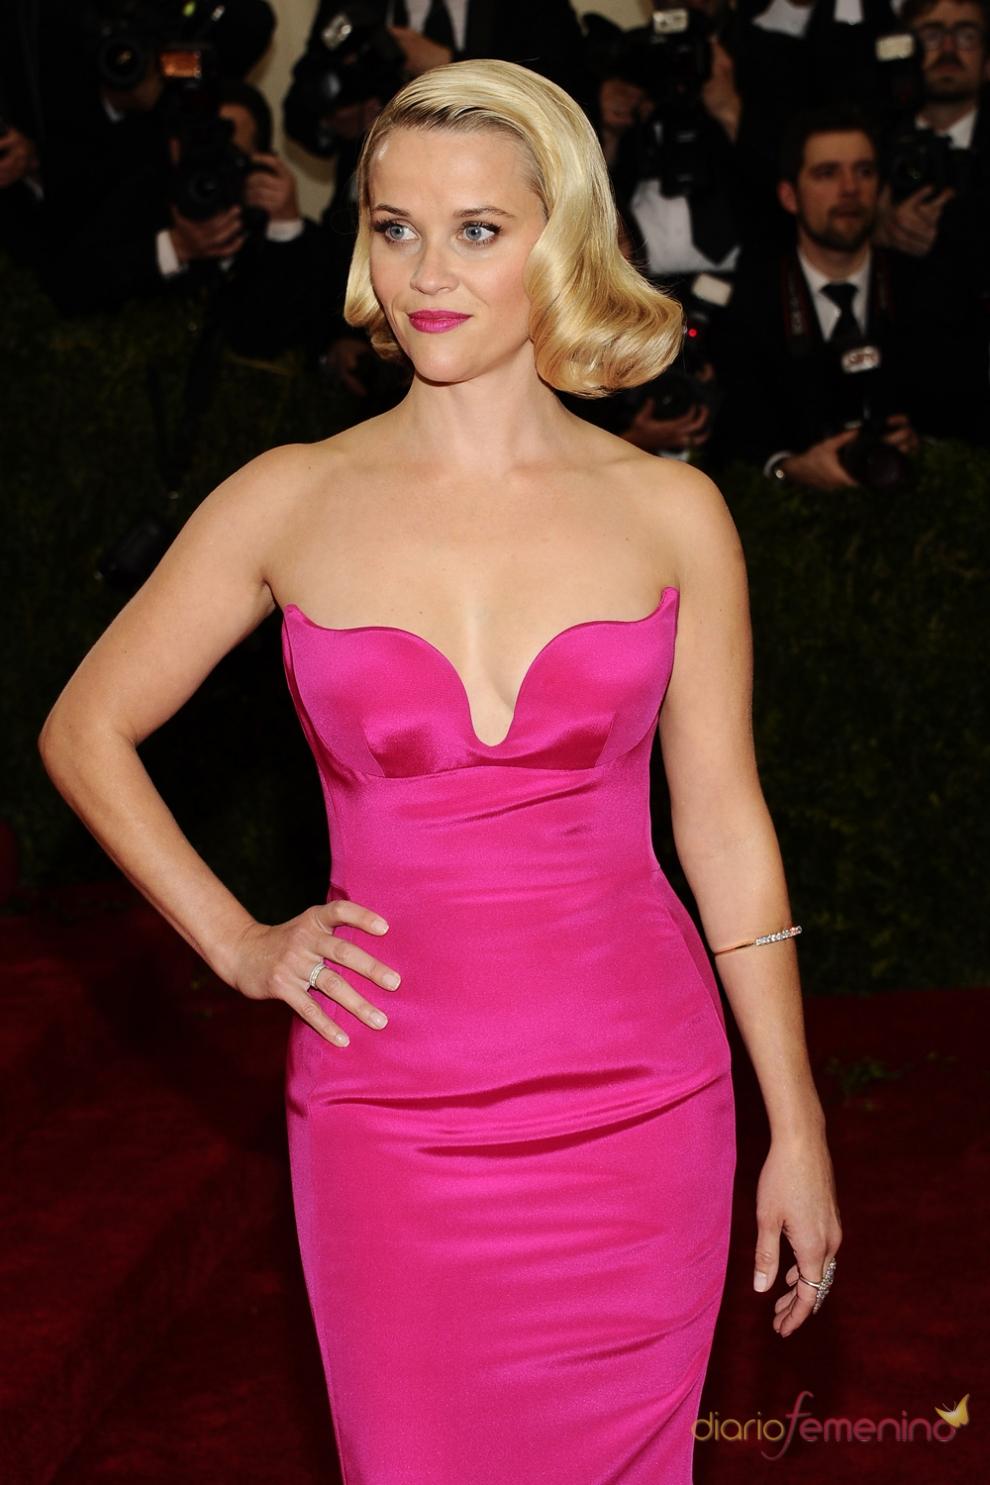 Reese Witherspoon, dama de rosa en el MET